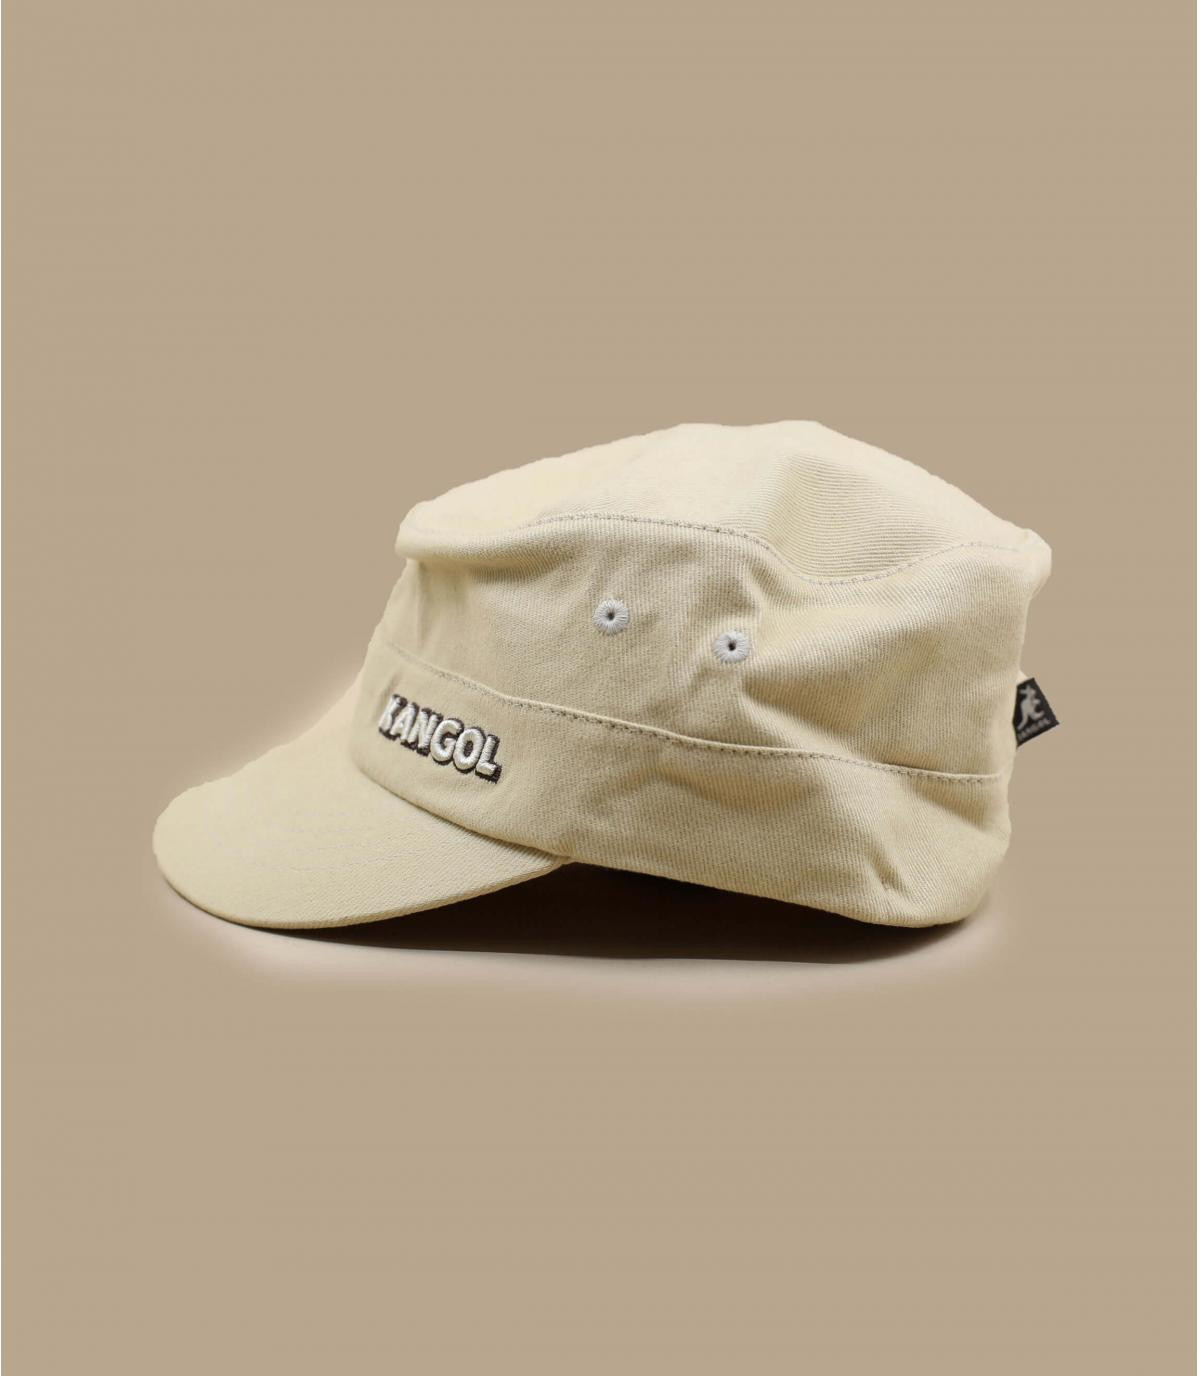 Details Cotton Twilll Army Cap beige - afbeeling 3